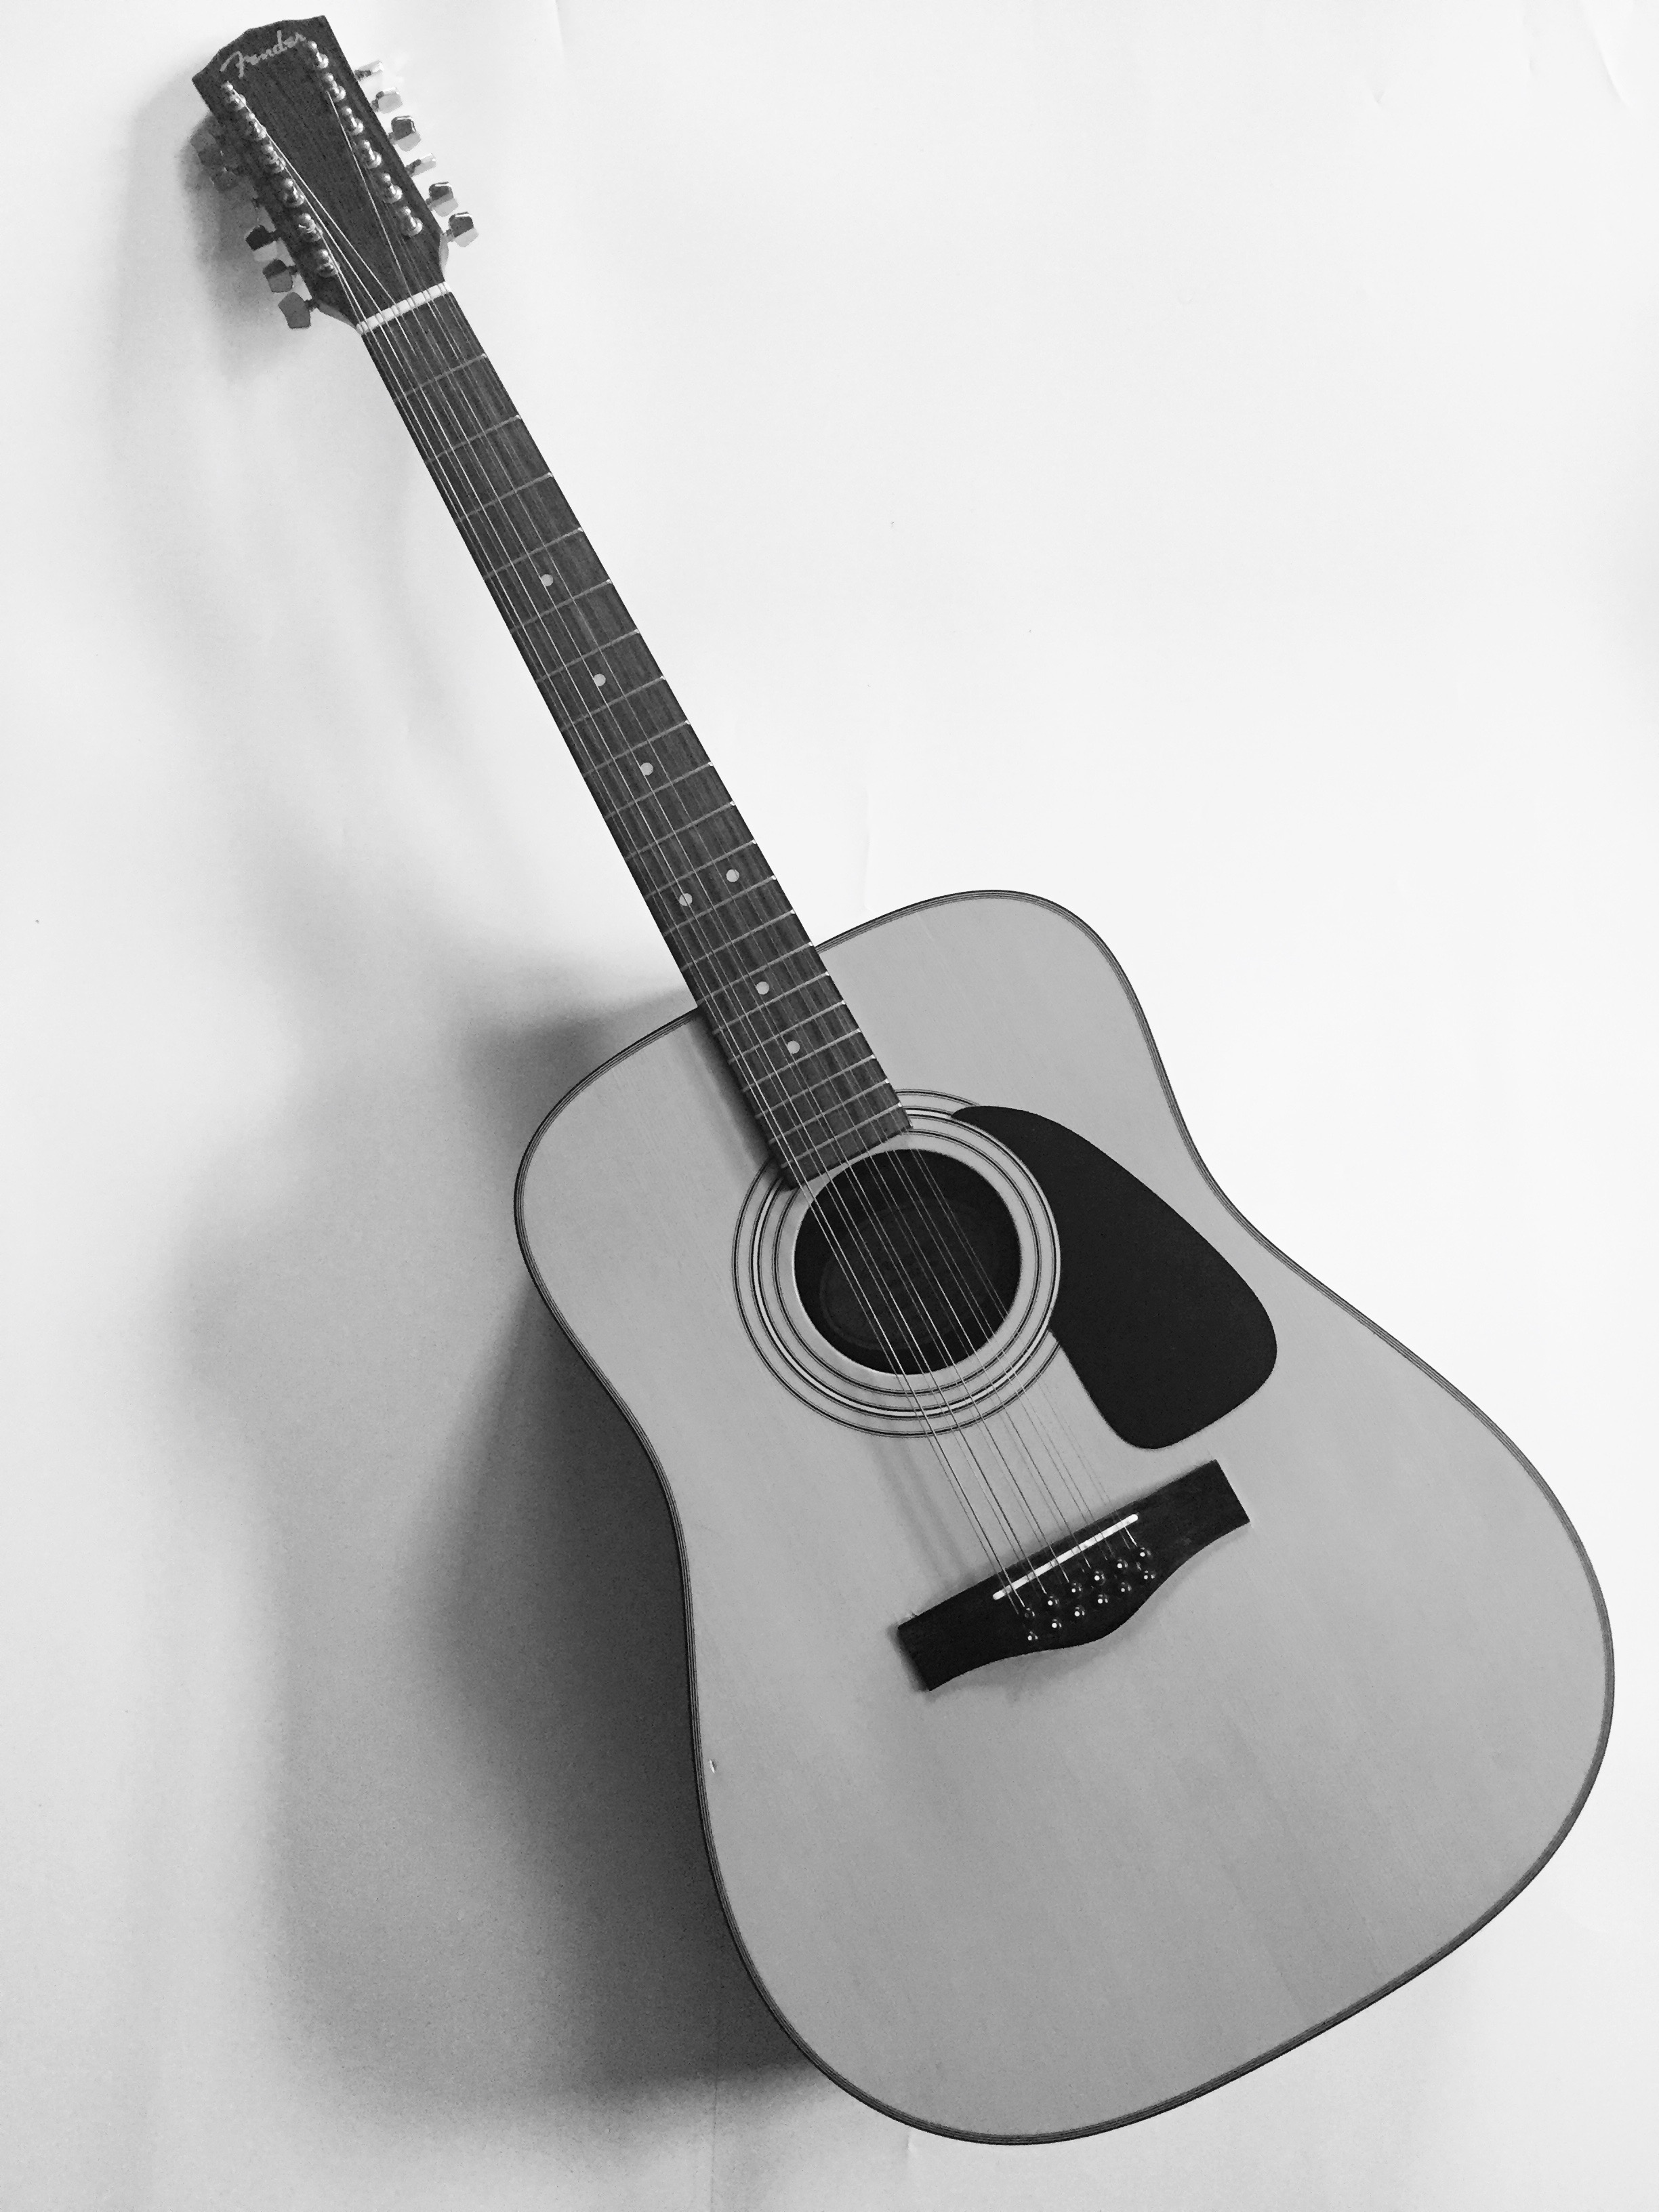 Ian Valor - Grandma's 12 String